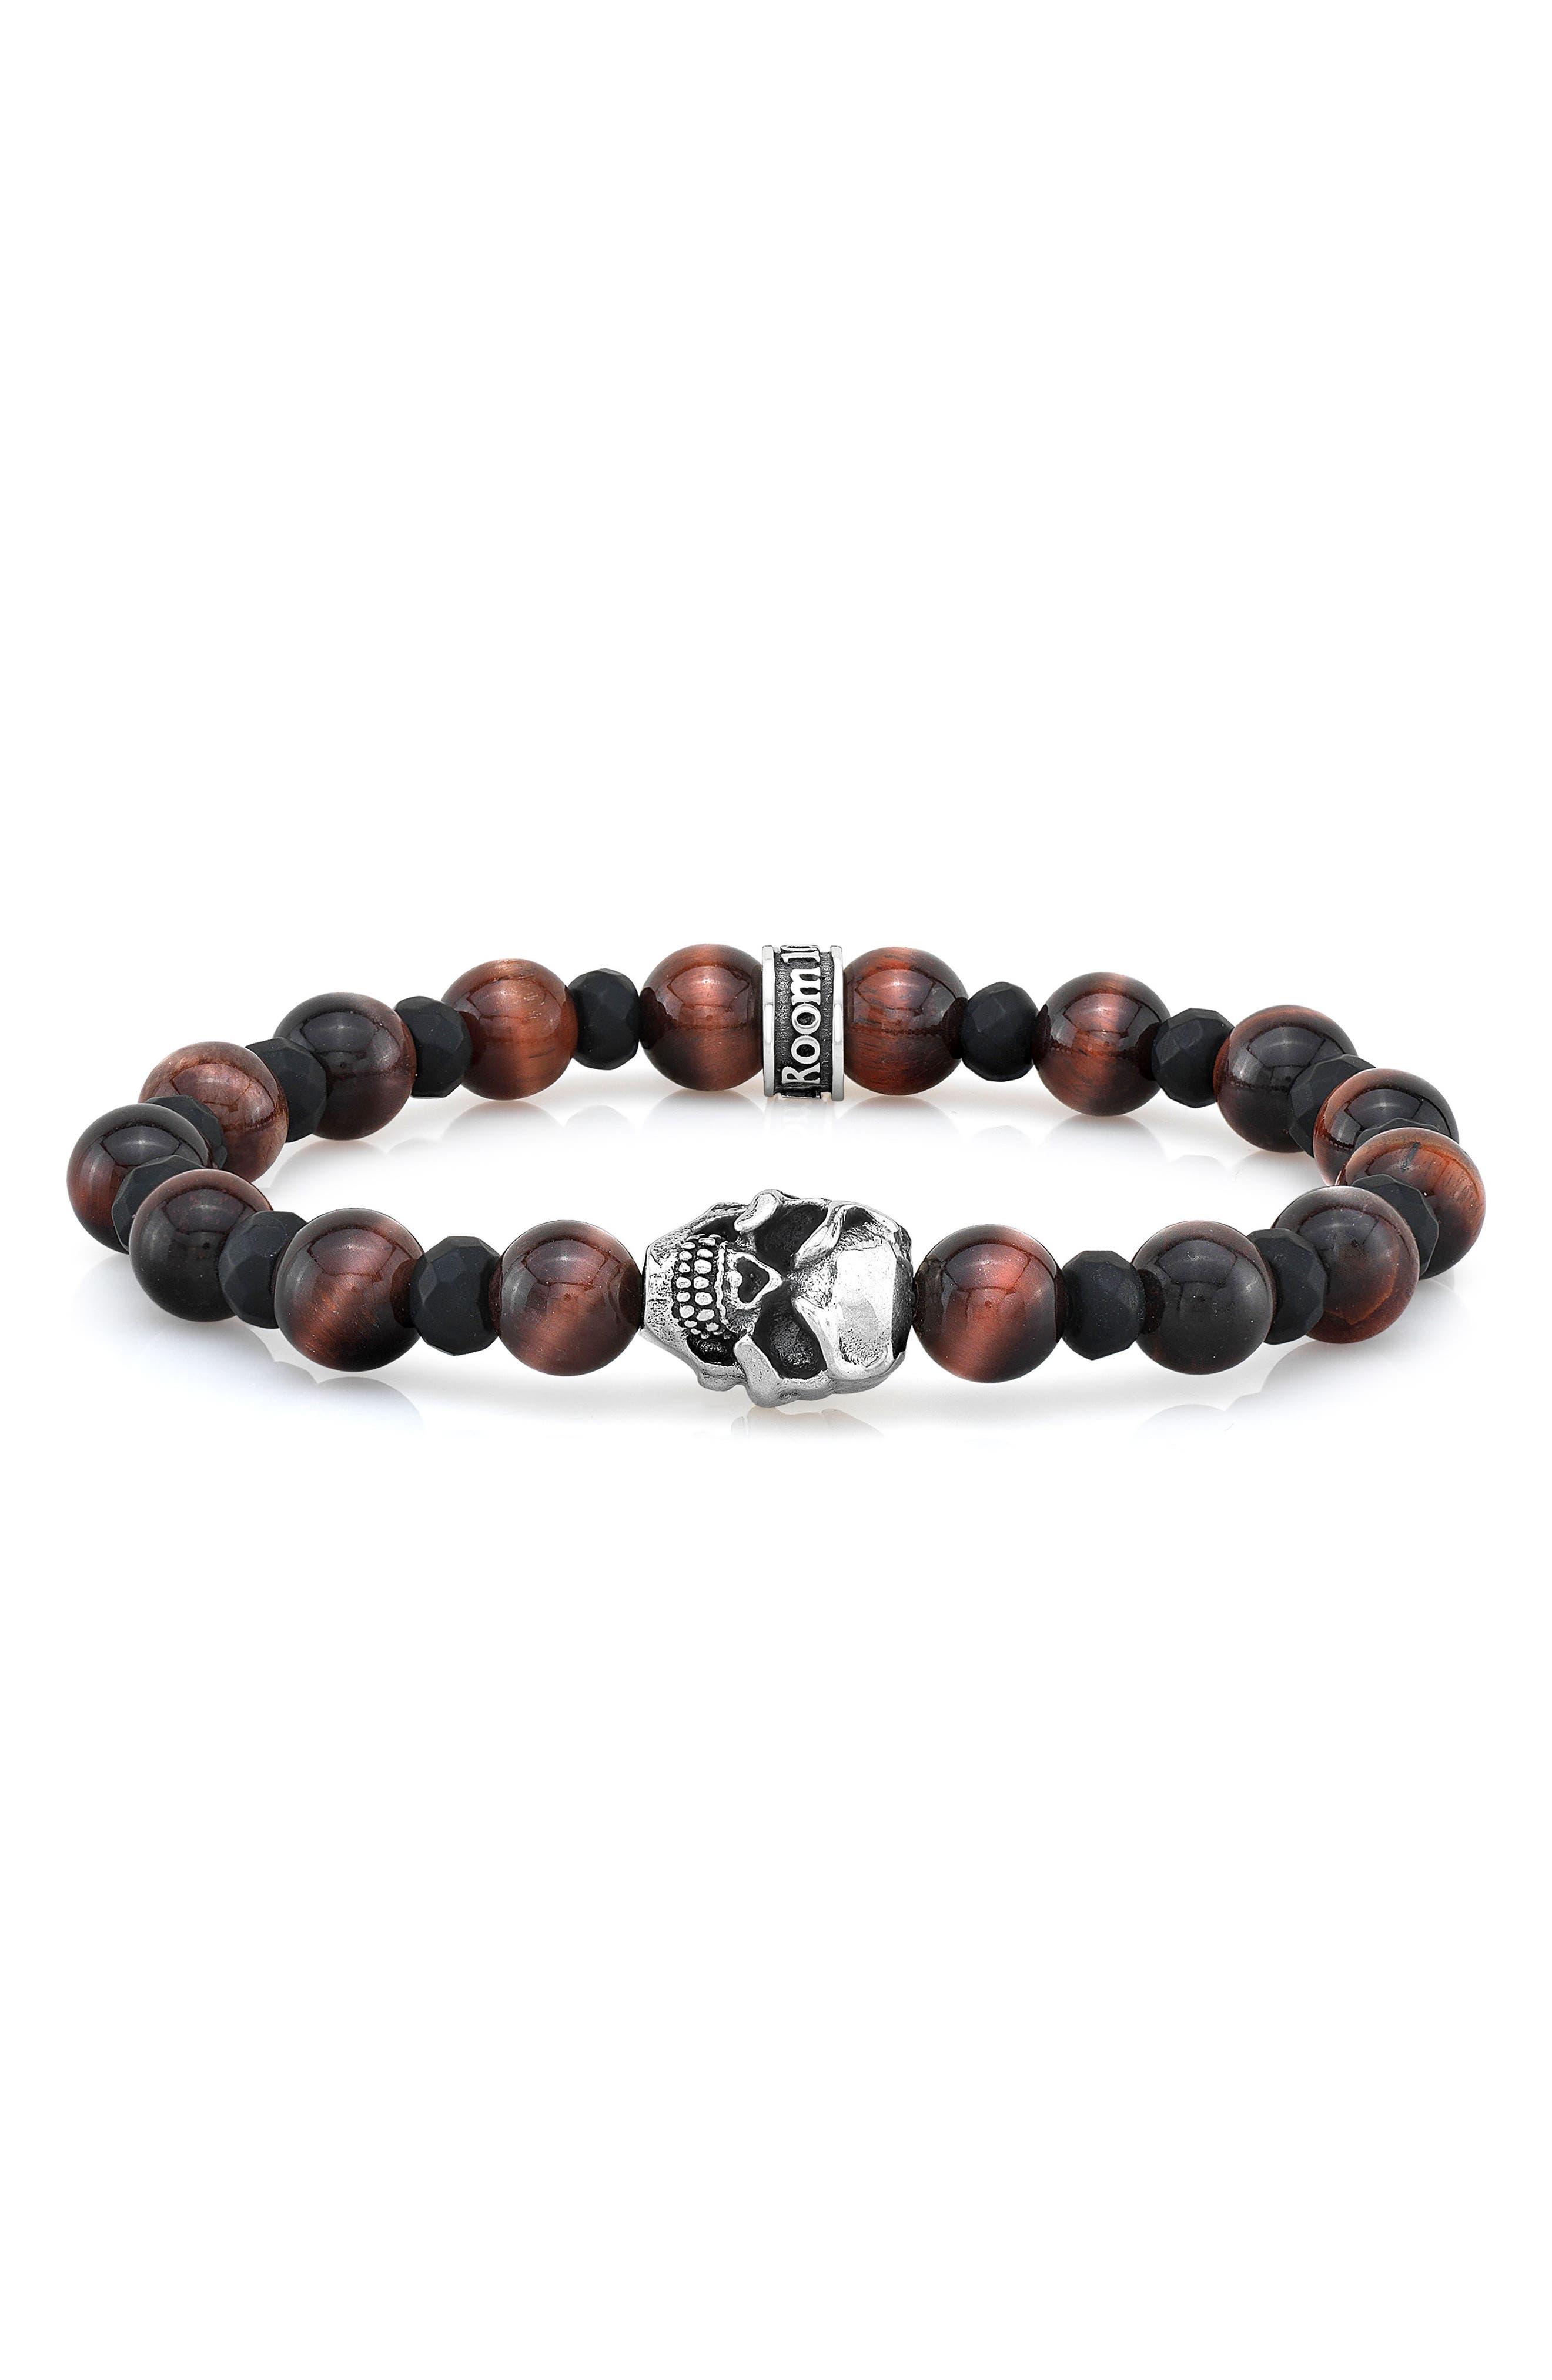 Tiger's Eye & Agate Bead Bracelet,                         Main,                         color, Red/ Black